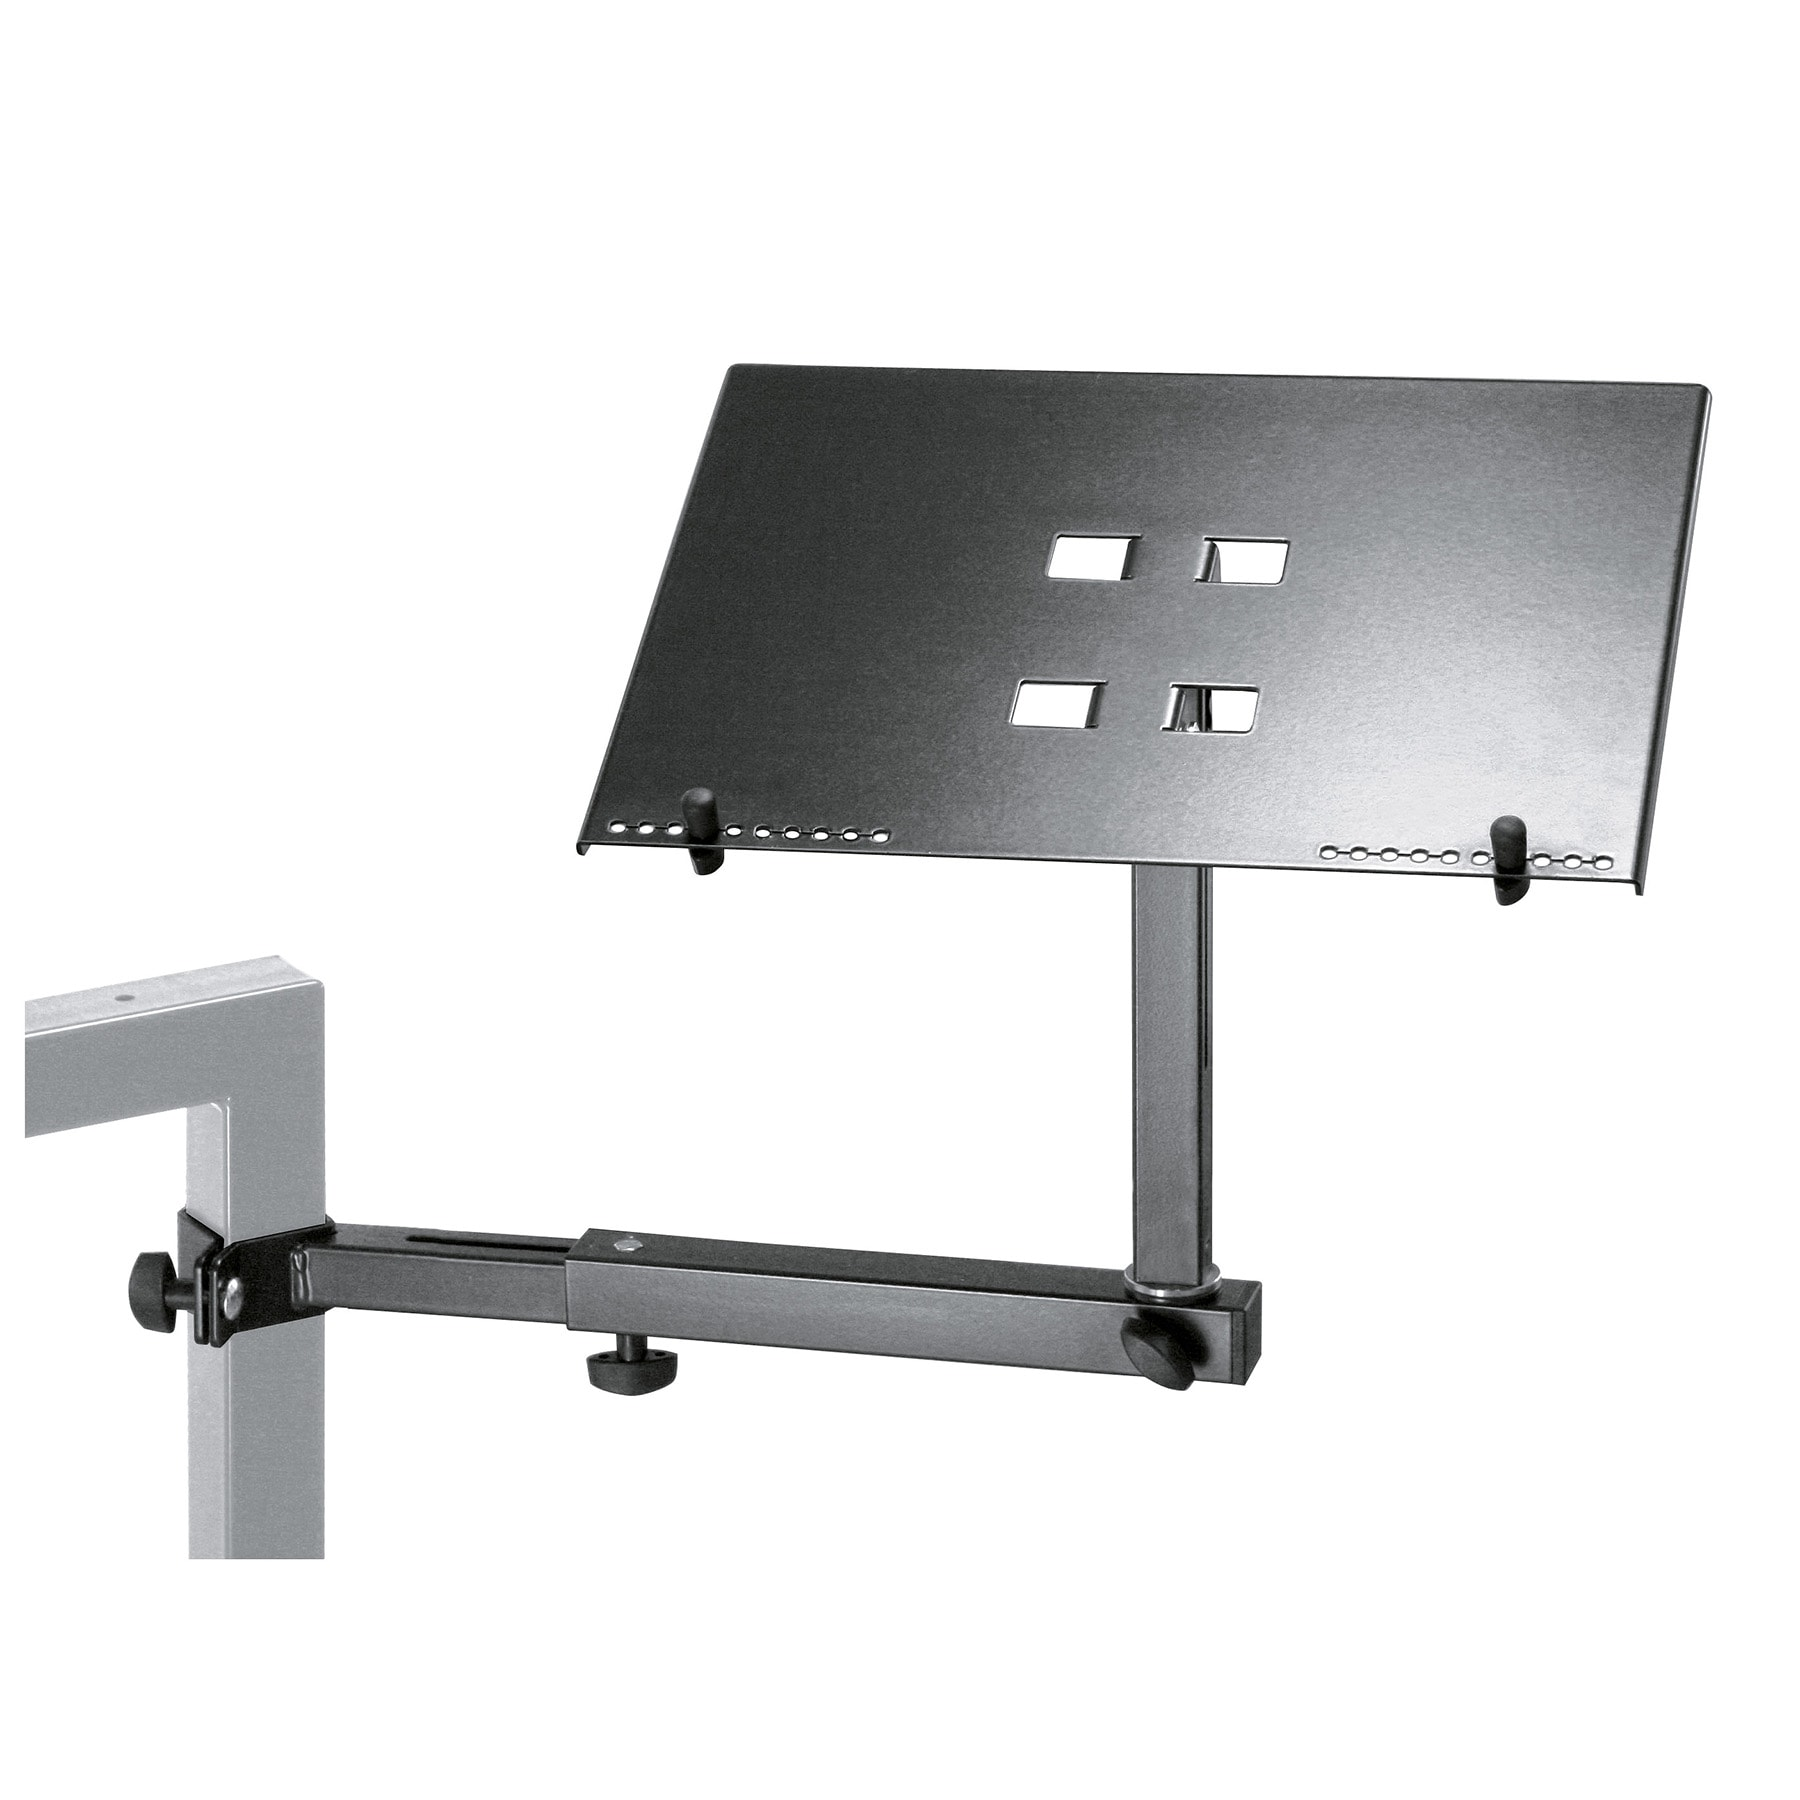 KM18815 - Laptop holder